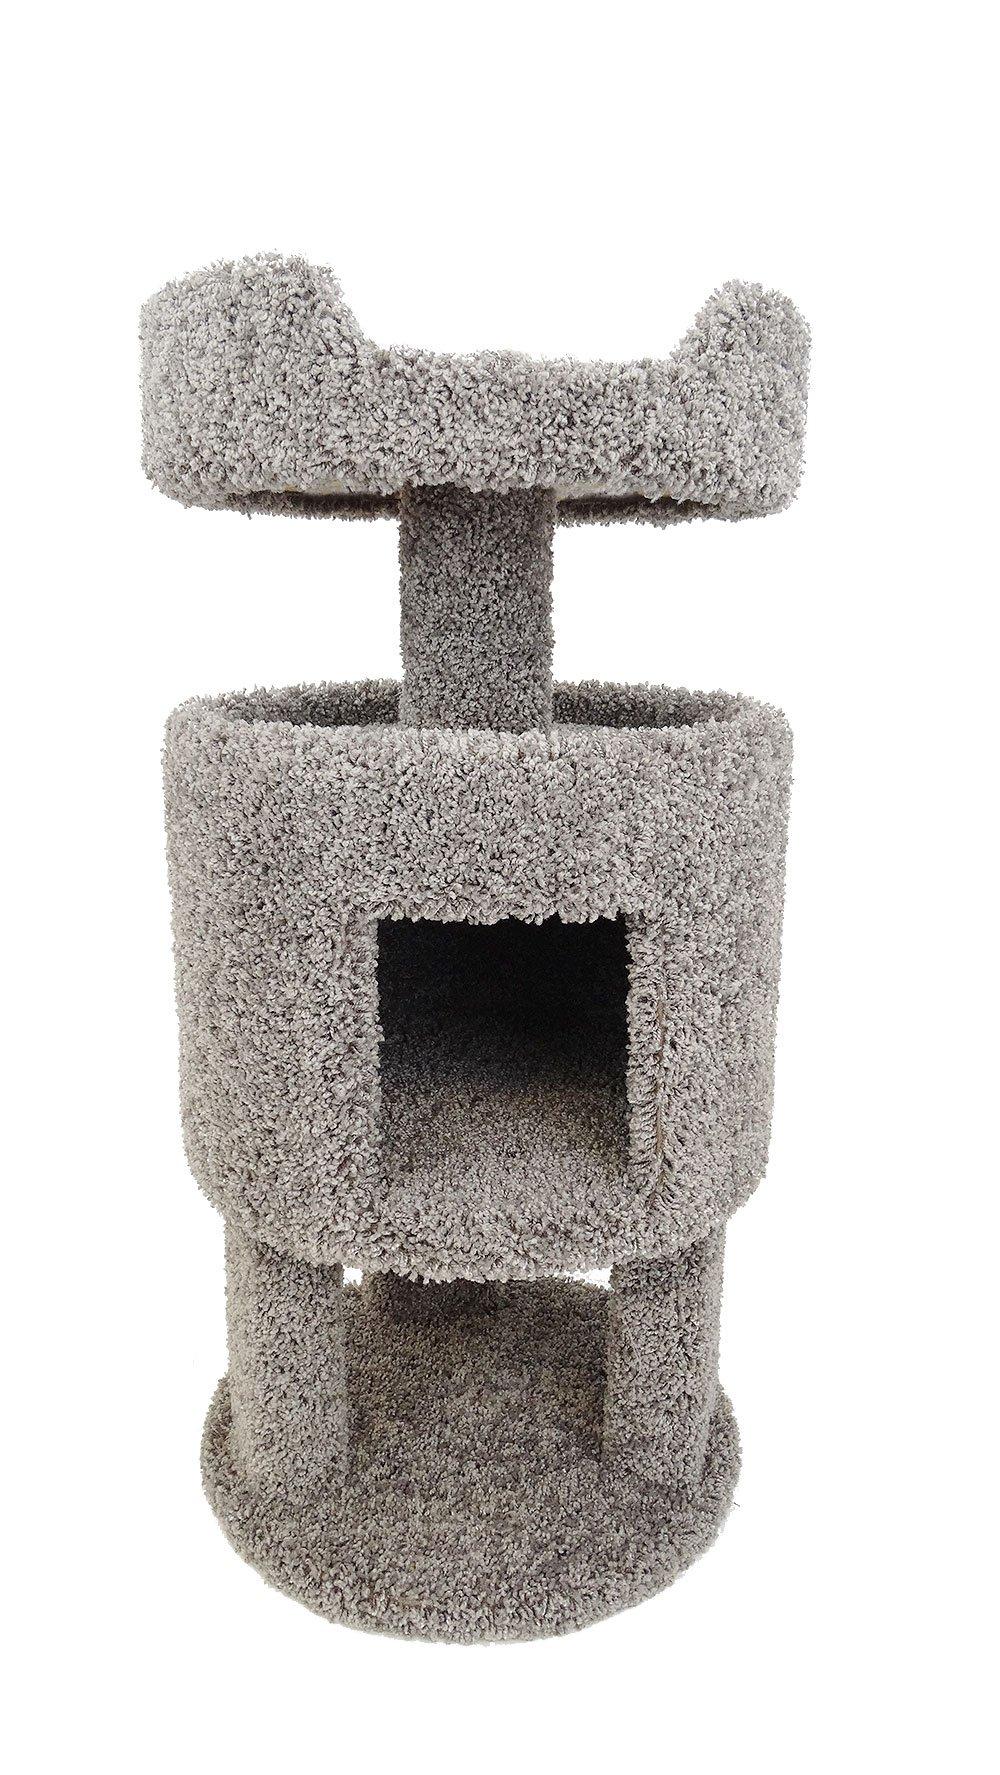 New Cat Condos Premier Contemporary Cat House, Gray